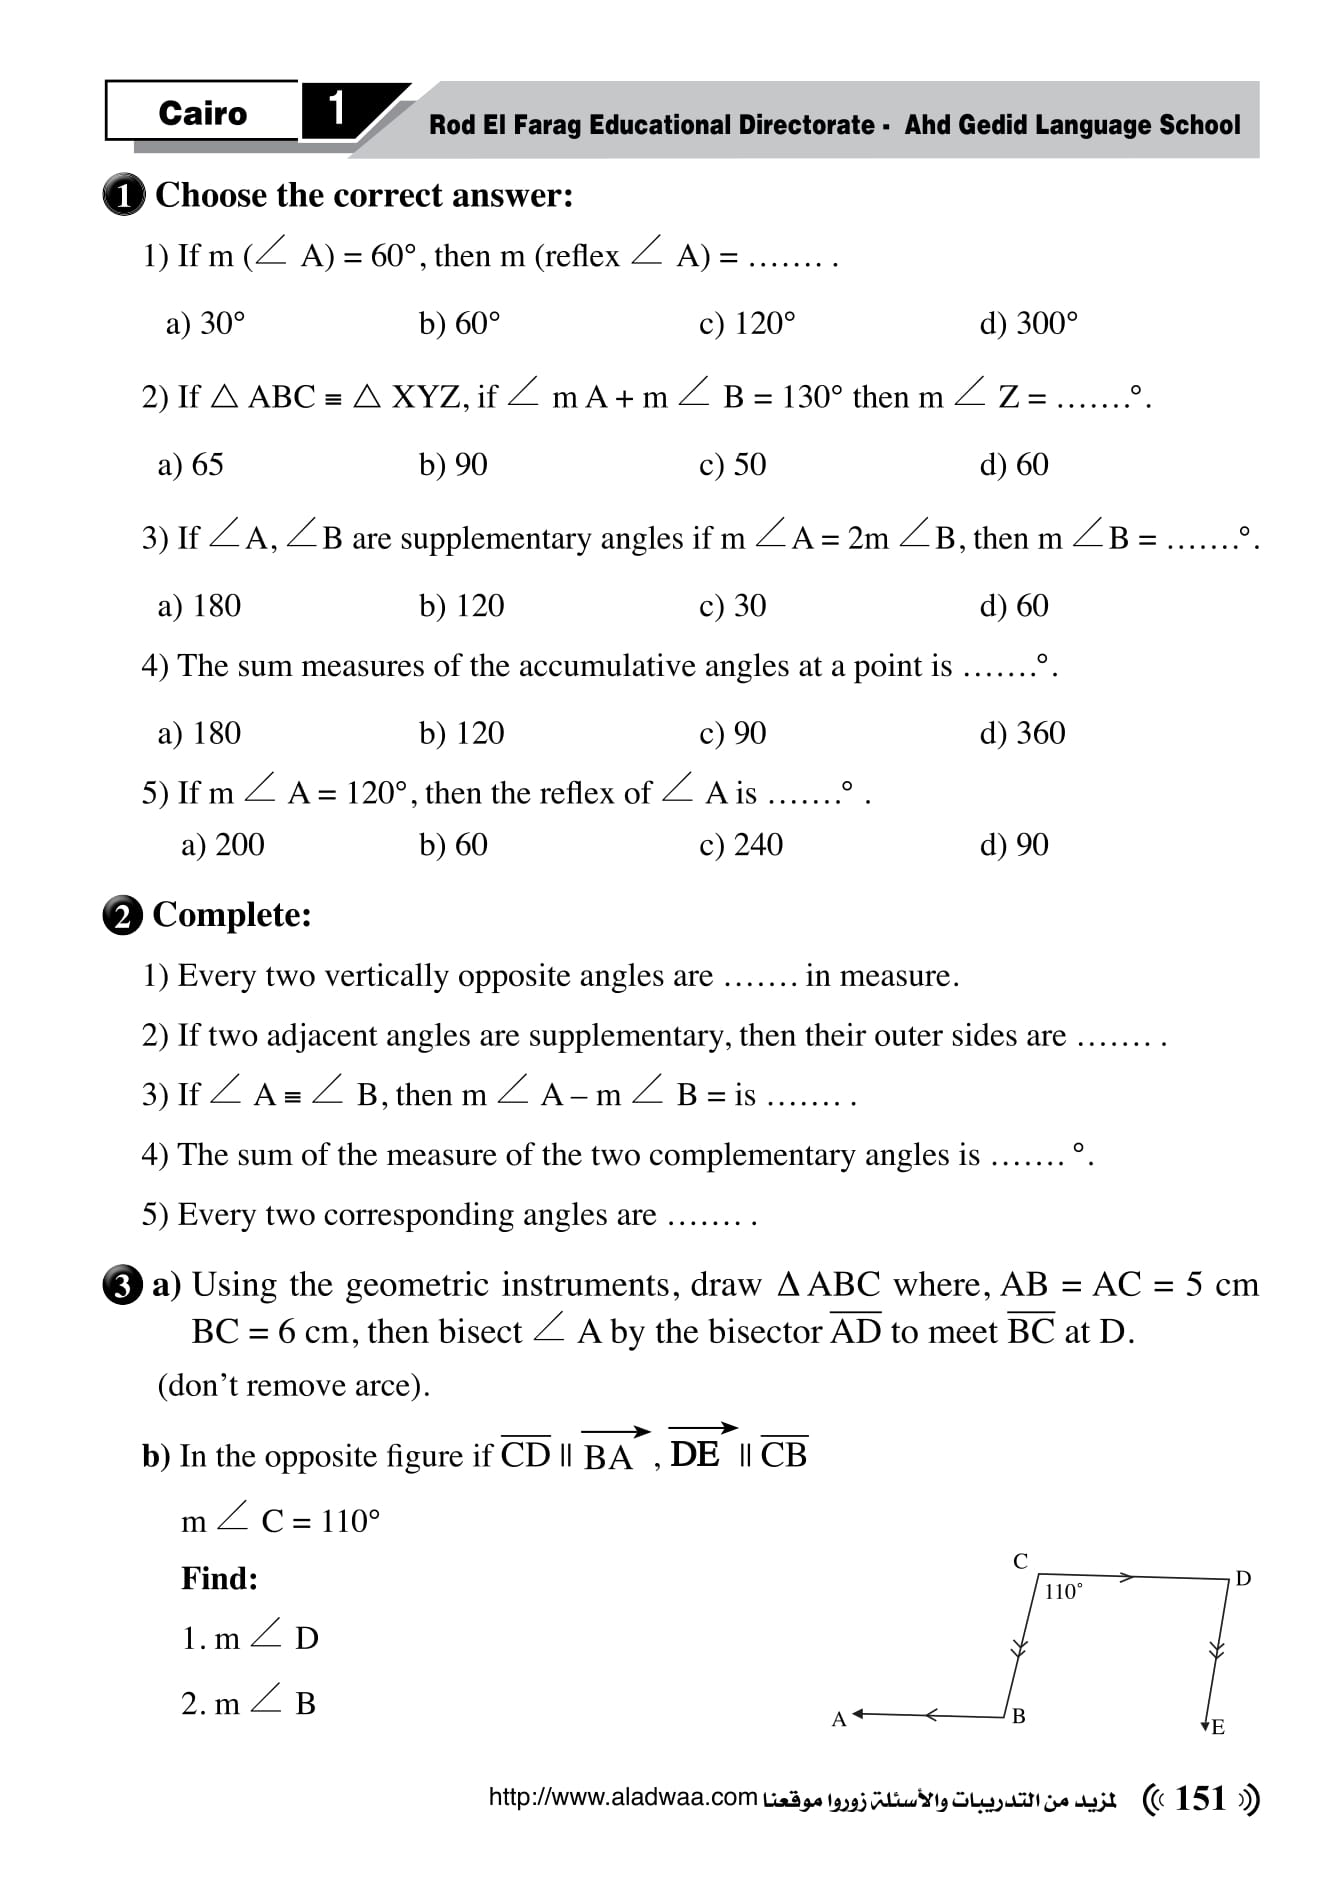 exam-eg.com_1510412413211.jpg